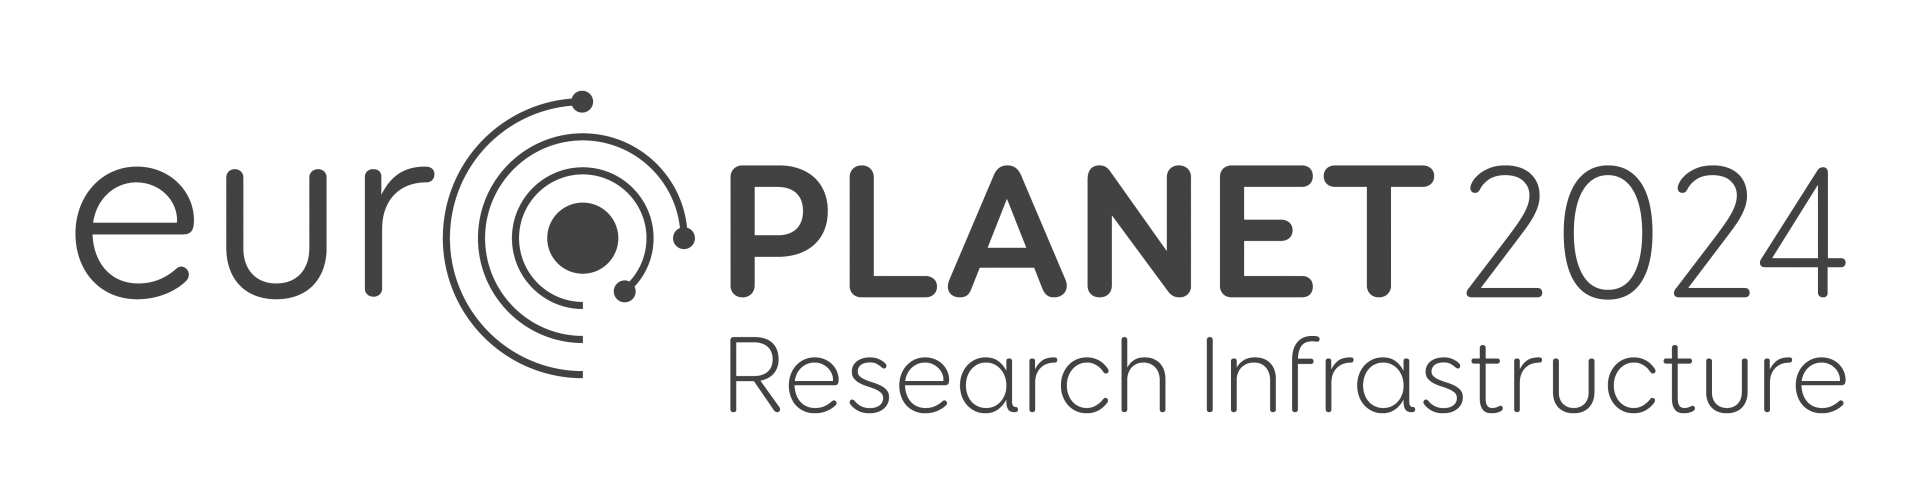 Europlanet 2024 RI logo